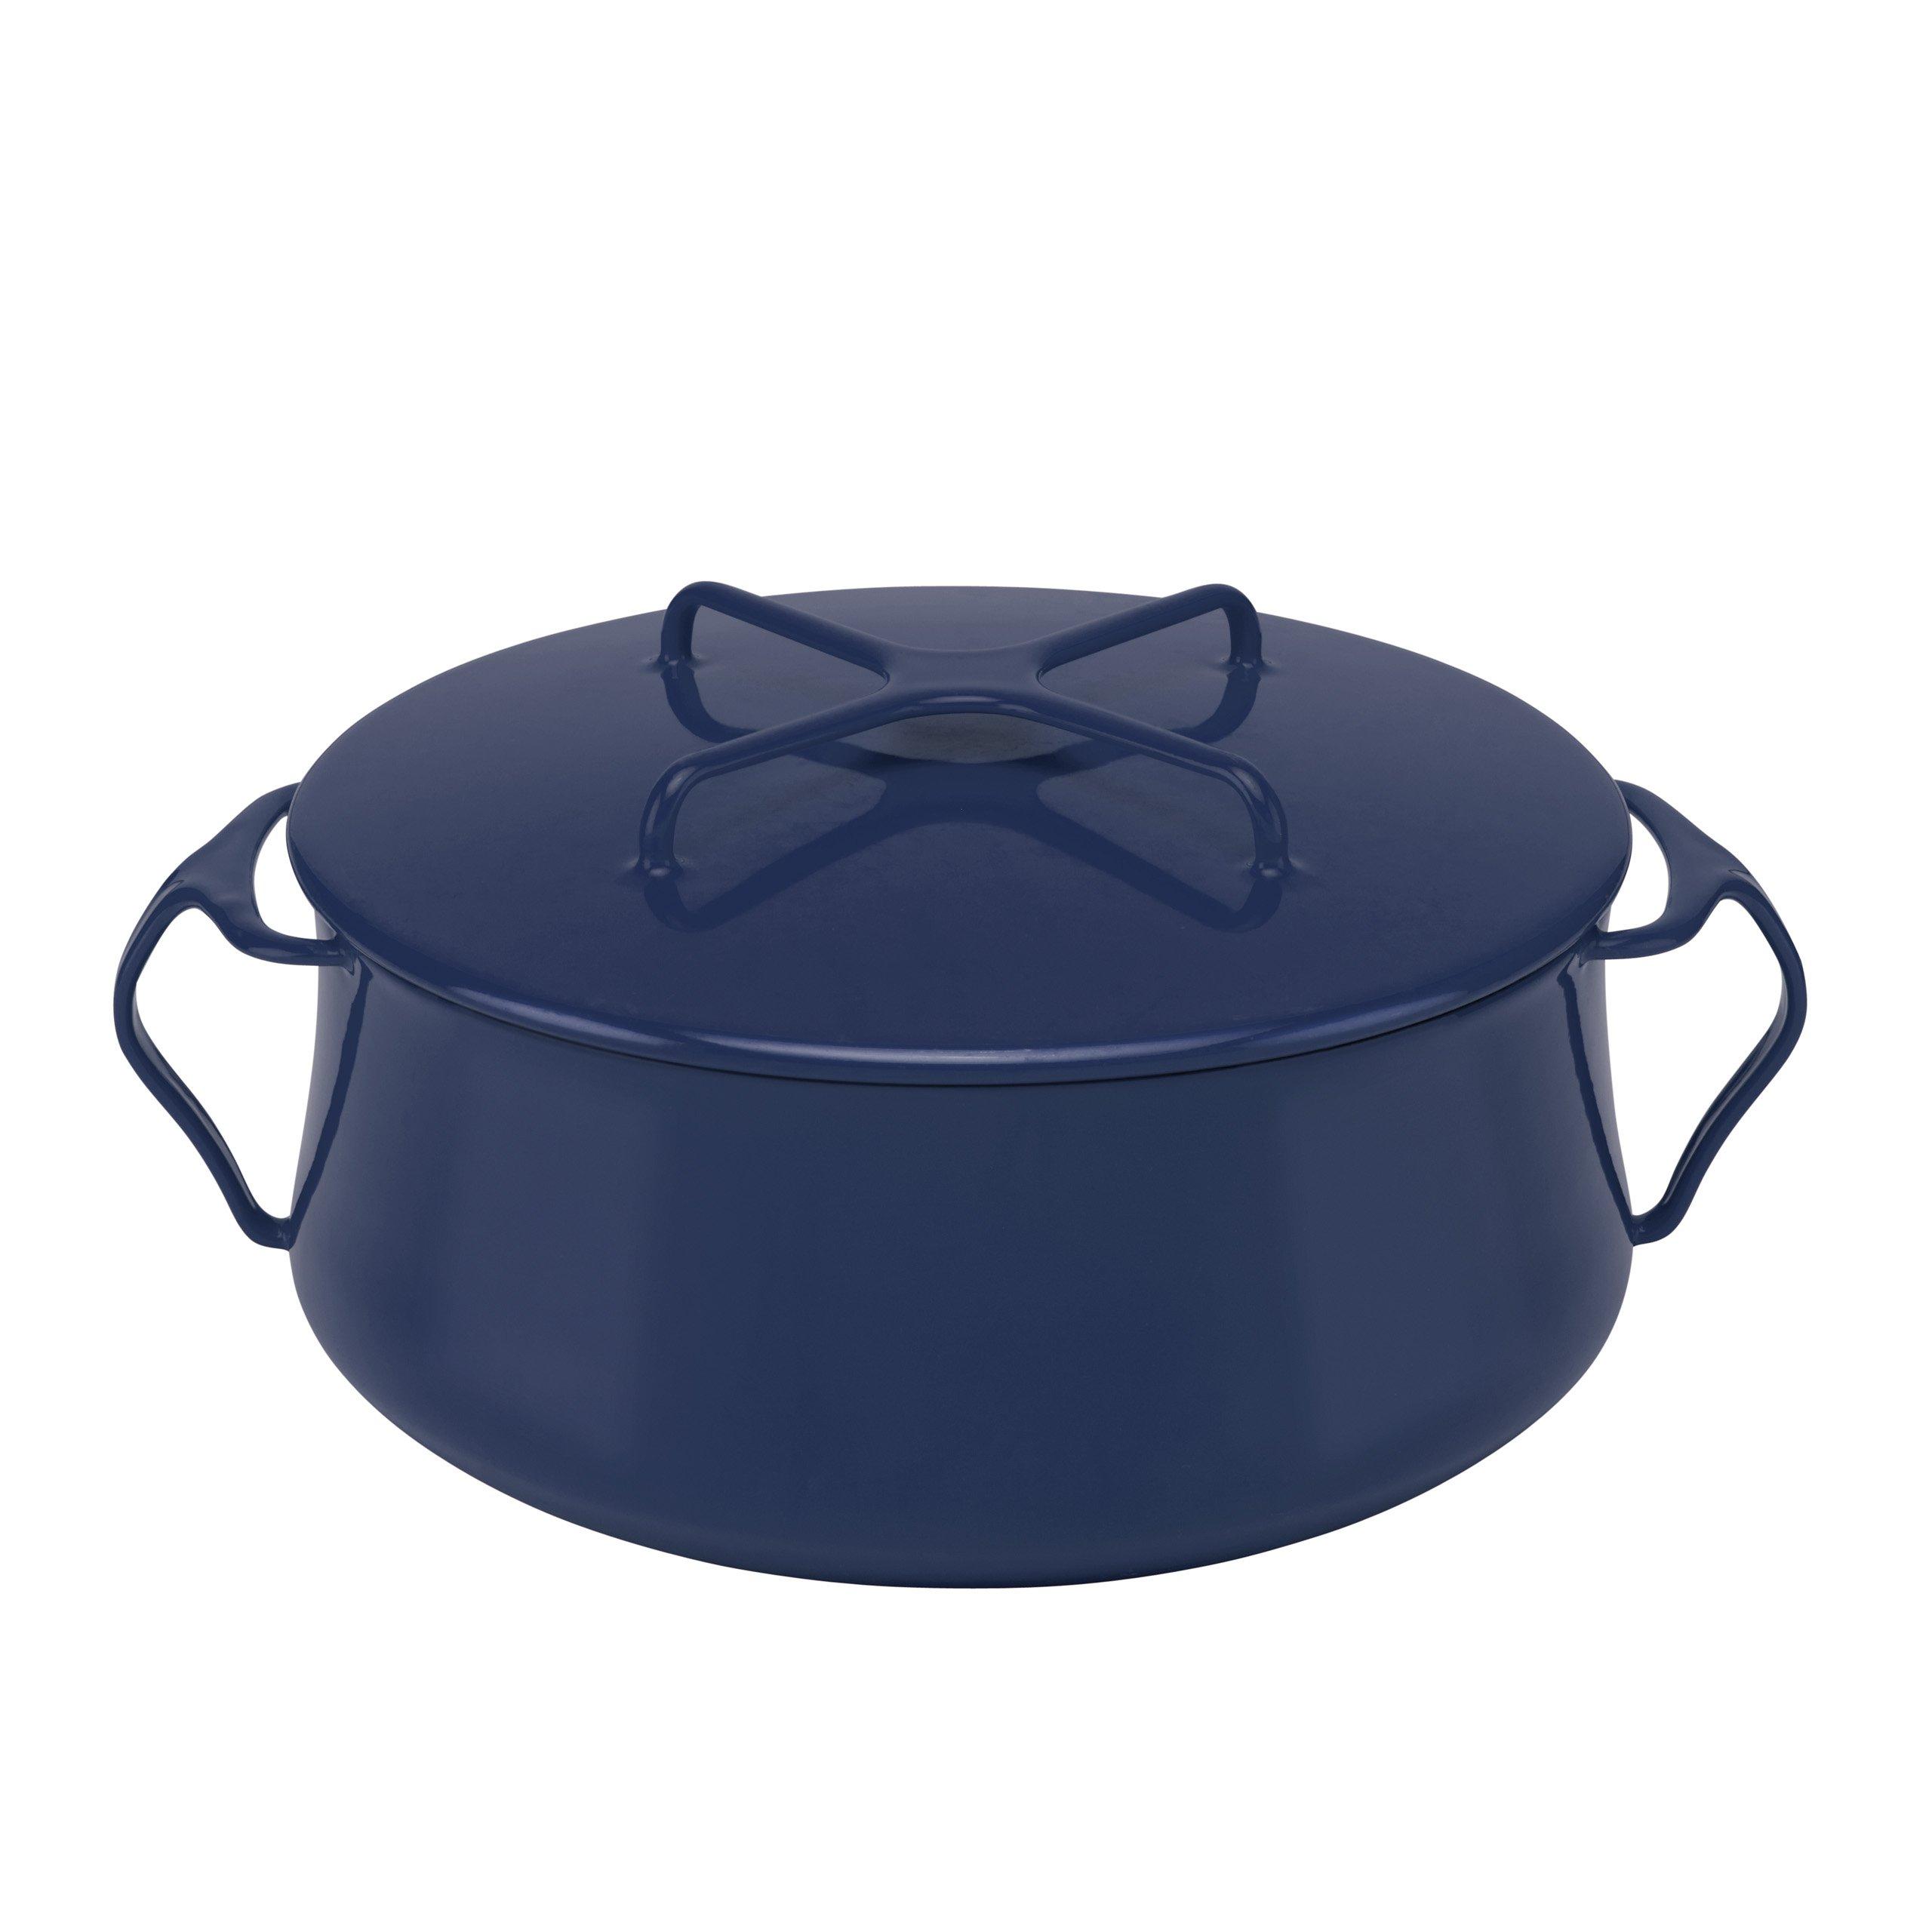 Dansk Kobenstyle Midnight Blue Casserole, 6-Quart